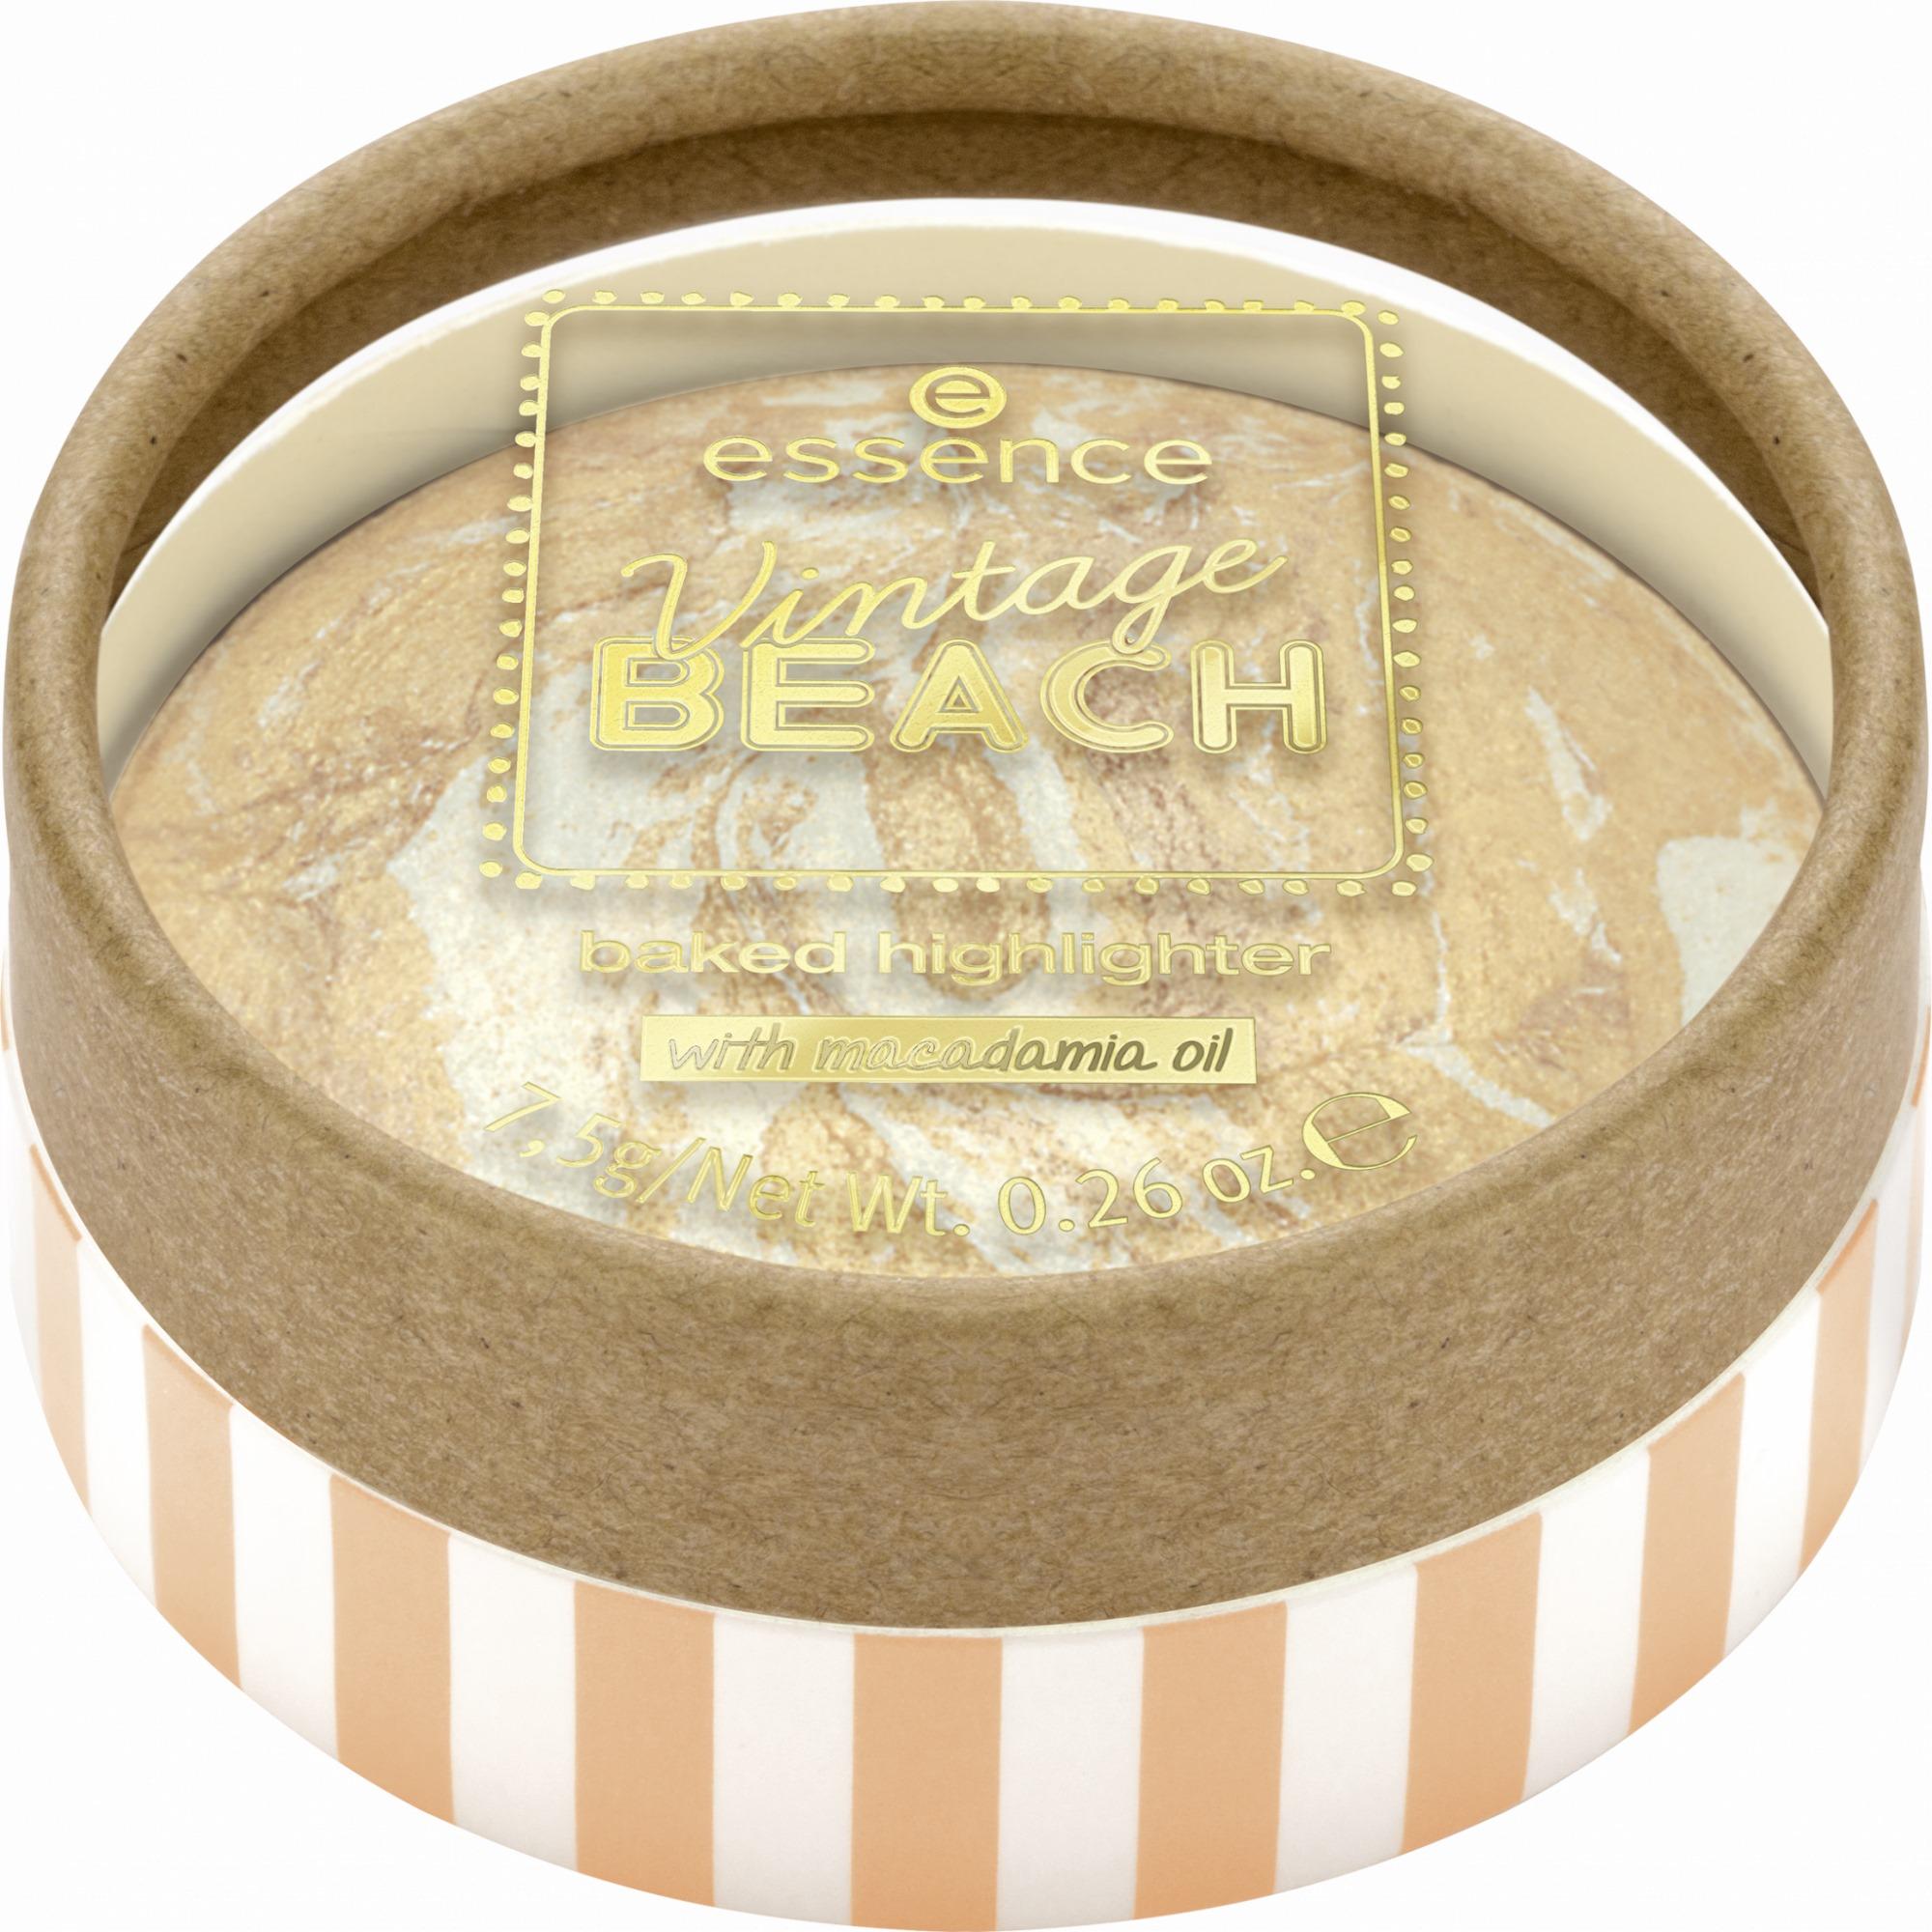 "Stigla je essence trendovska kolekcija ""Vintage Beach"" nadahnuta retro plažama"